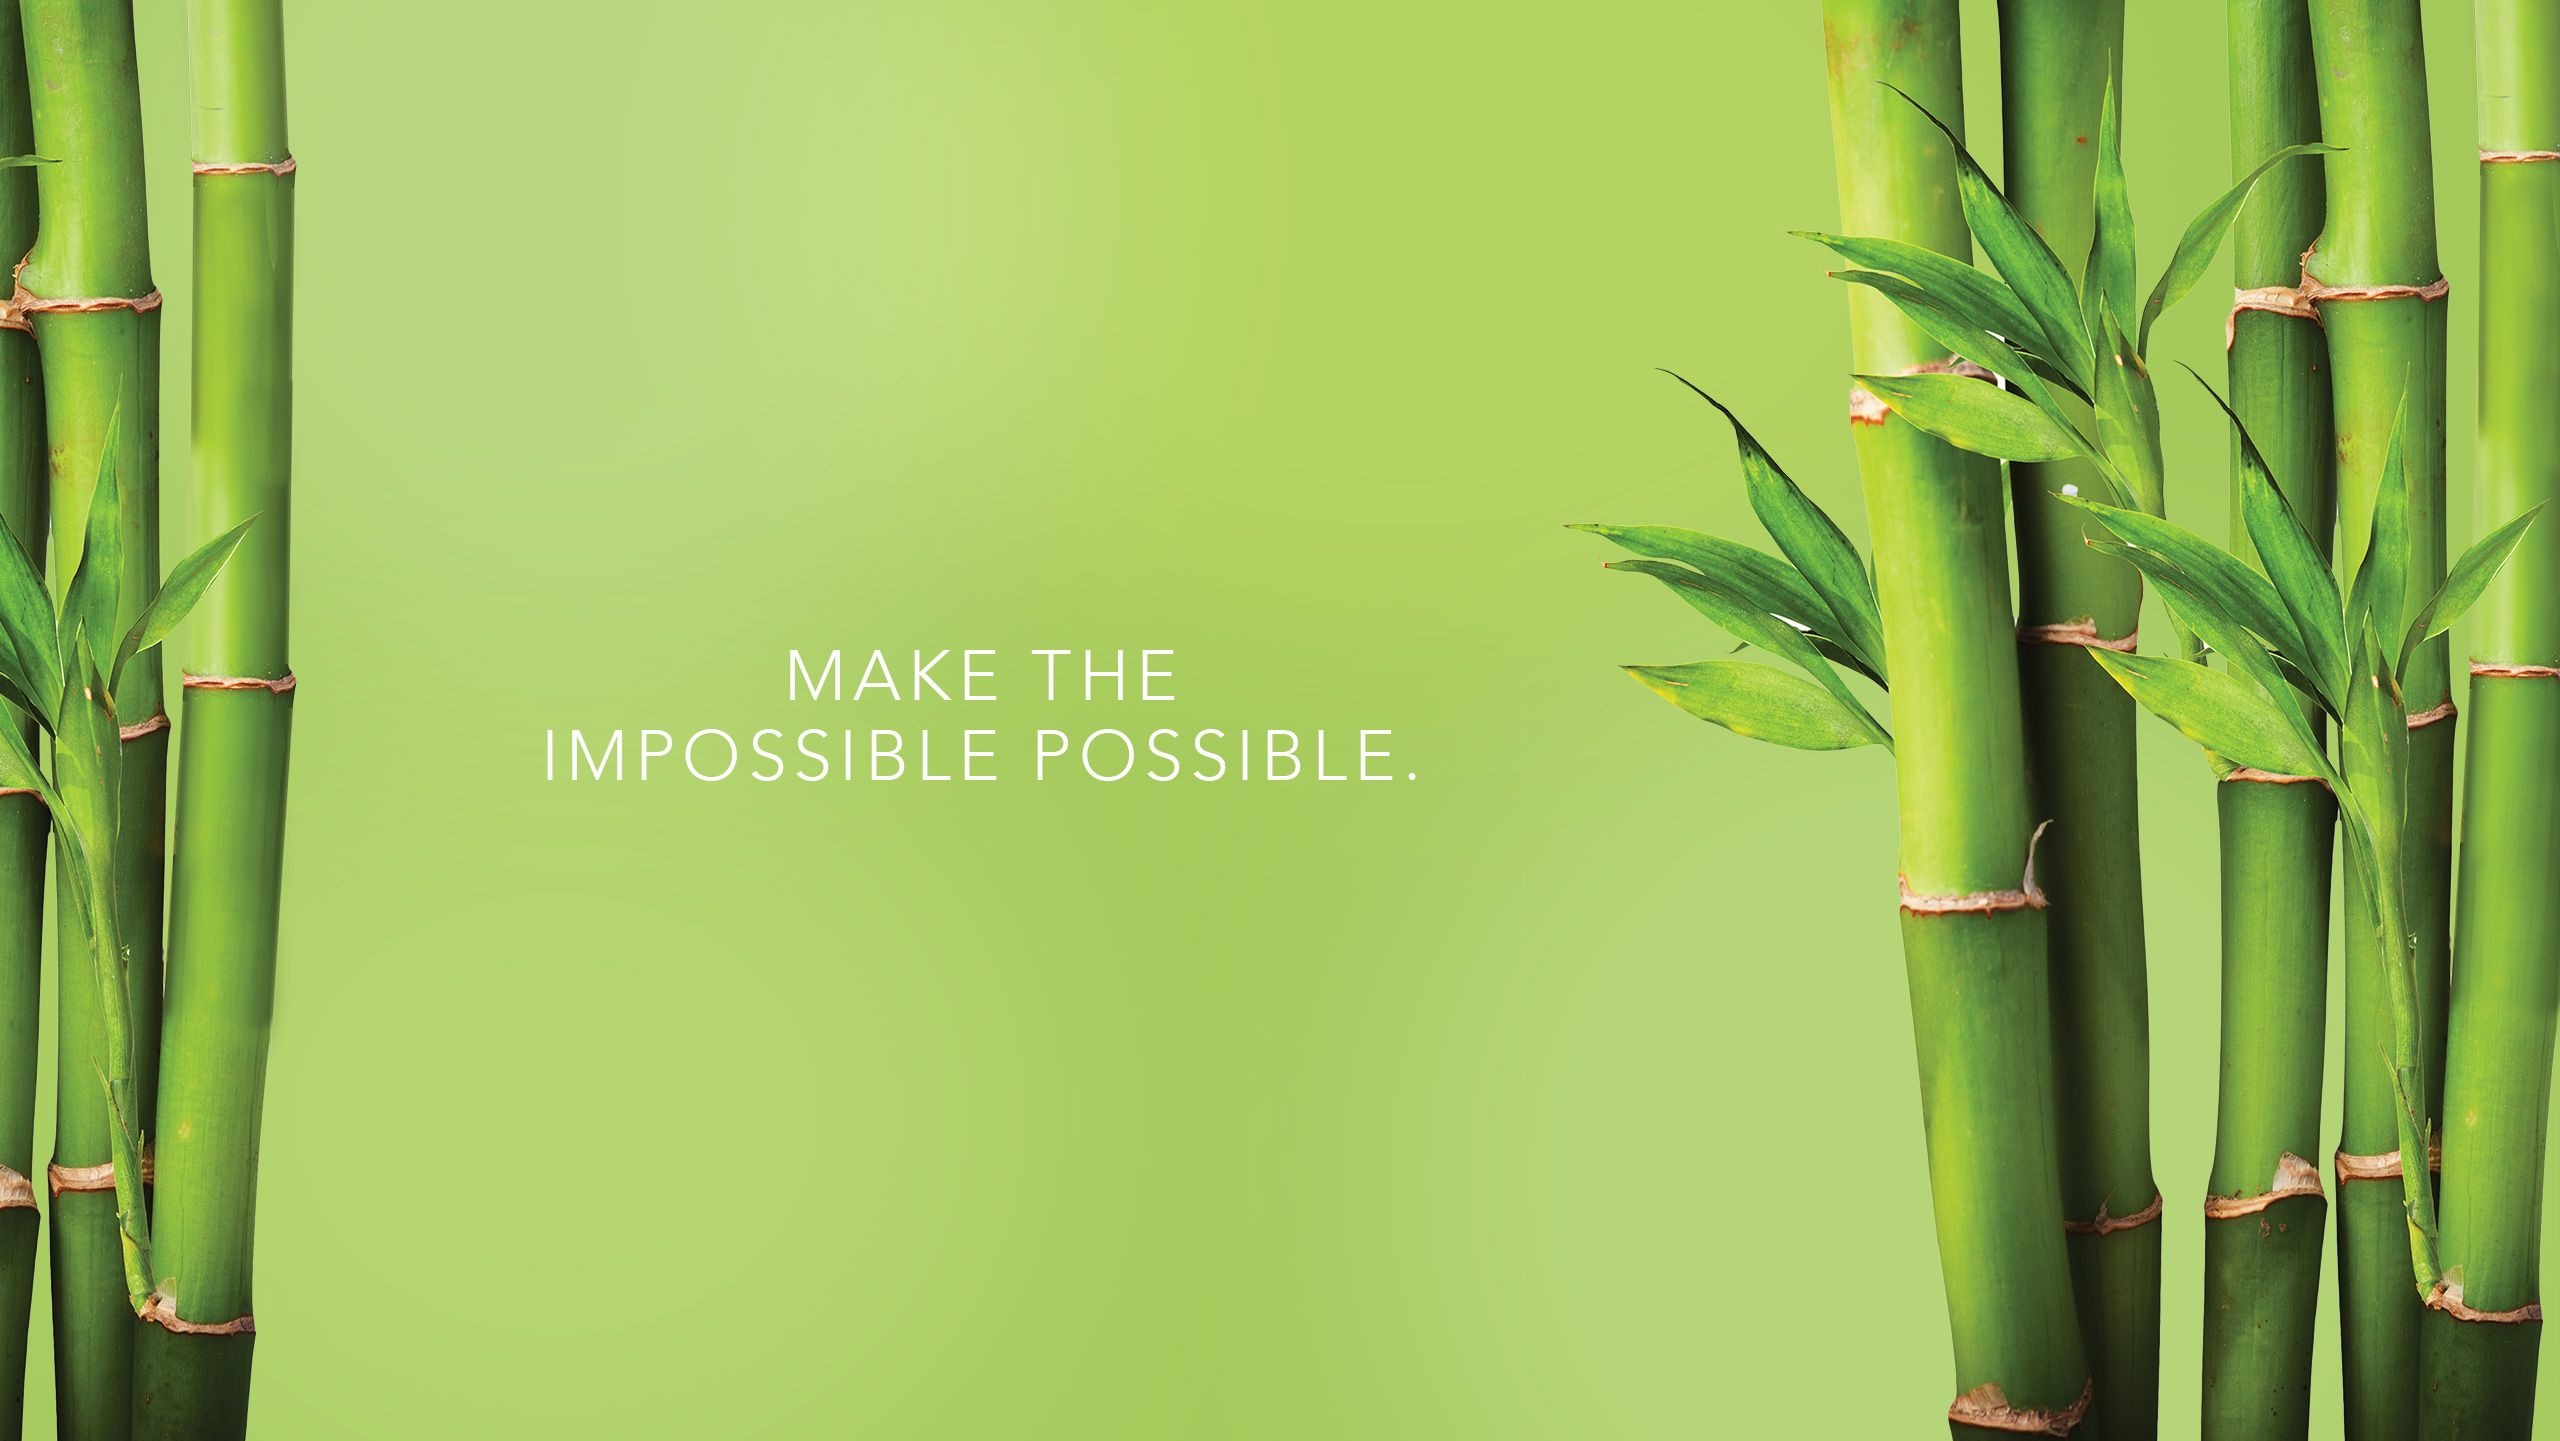 Hd Bamboo Backgrounds Download Bamboo Wallpaper Bamboo